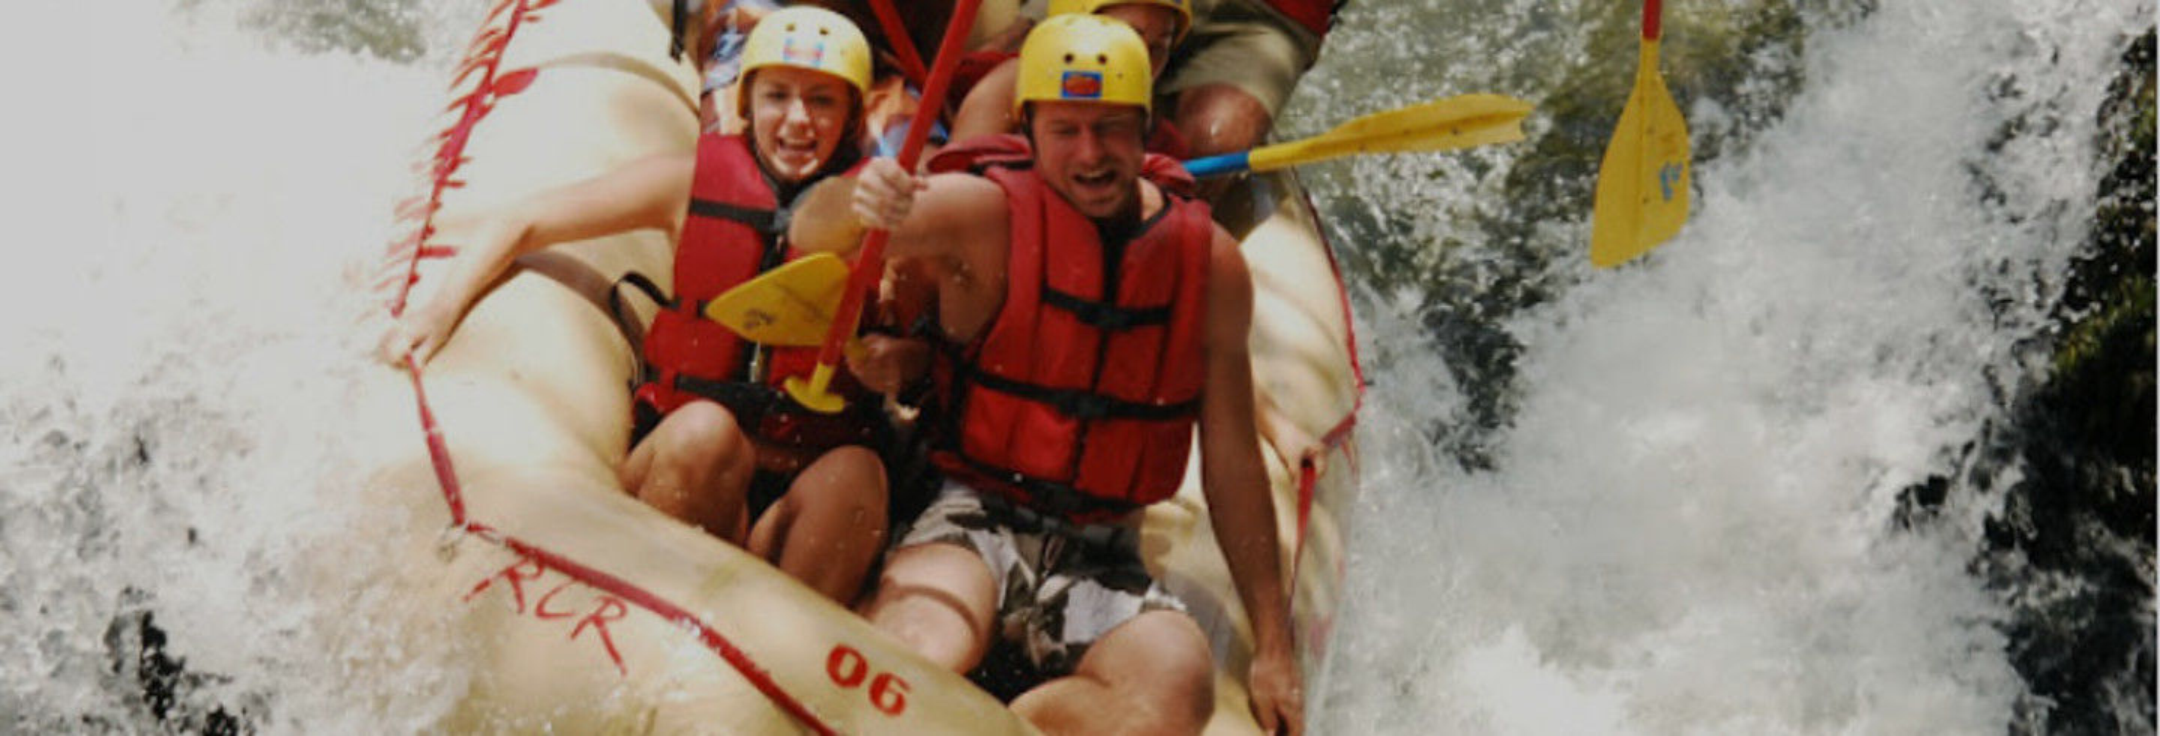 Rafting sul fiume Tenorio